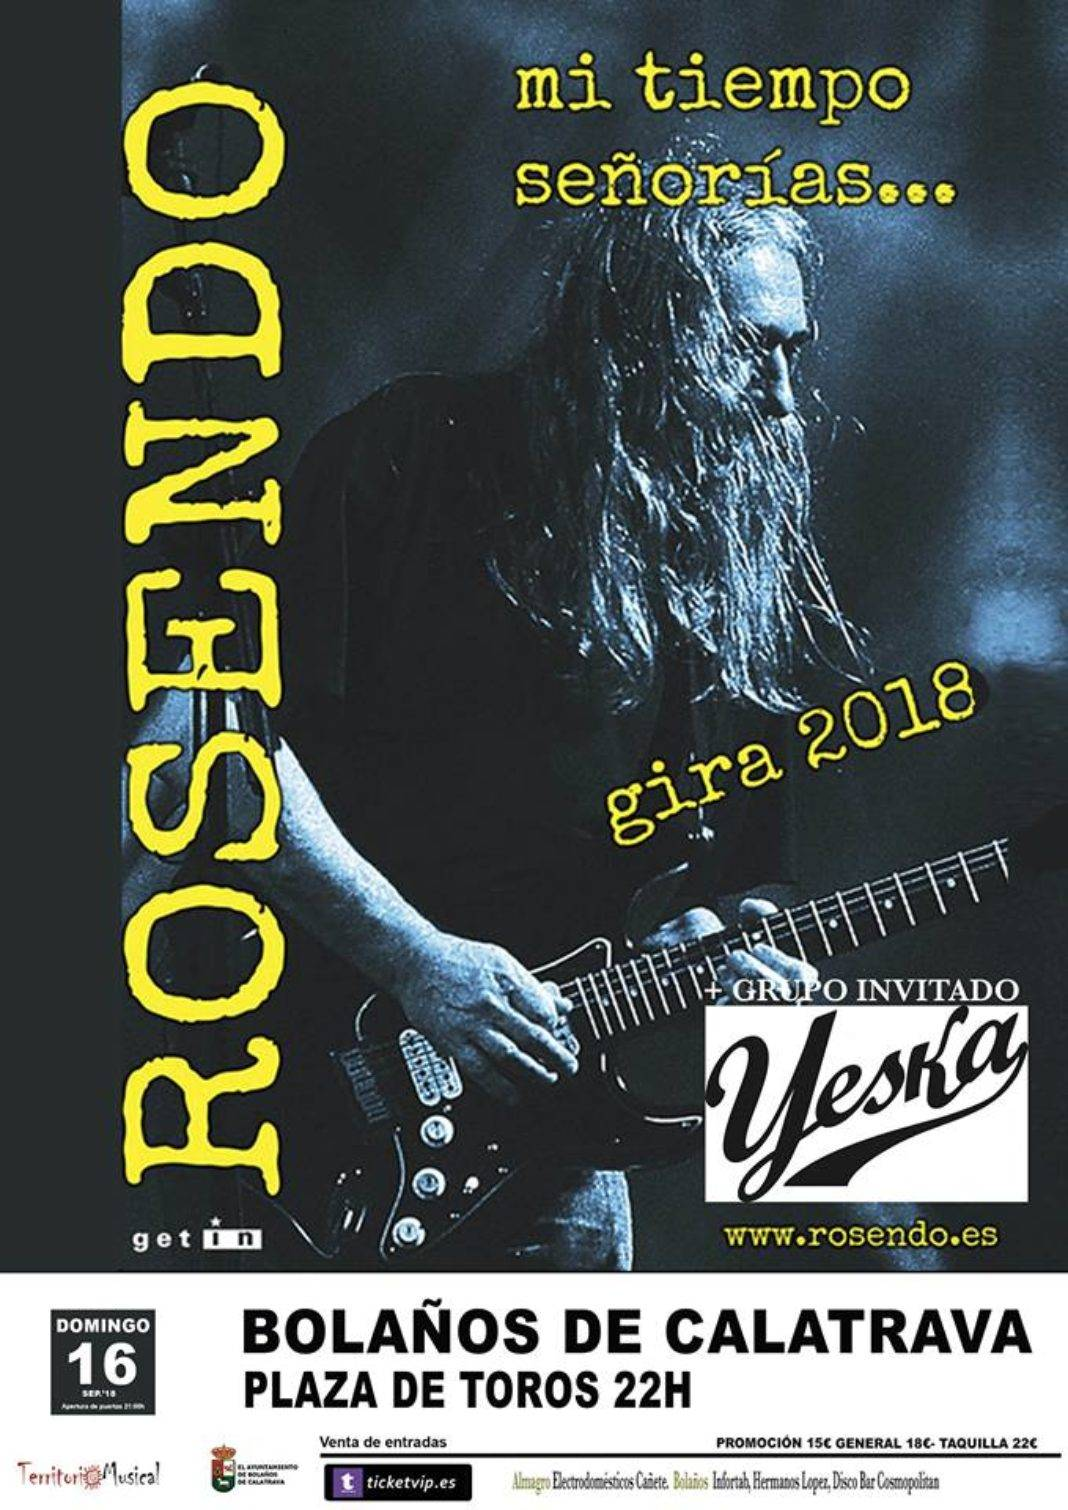 Yeska tocará en Bolaños de Calatrava como grupo invitado de Rosendo 4